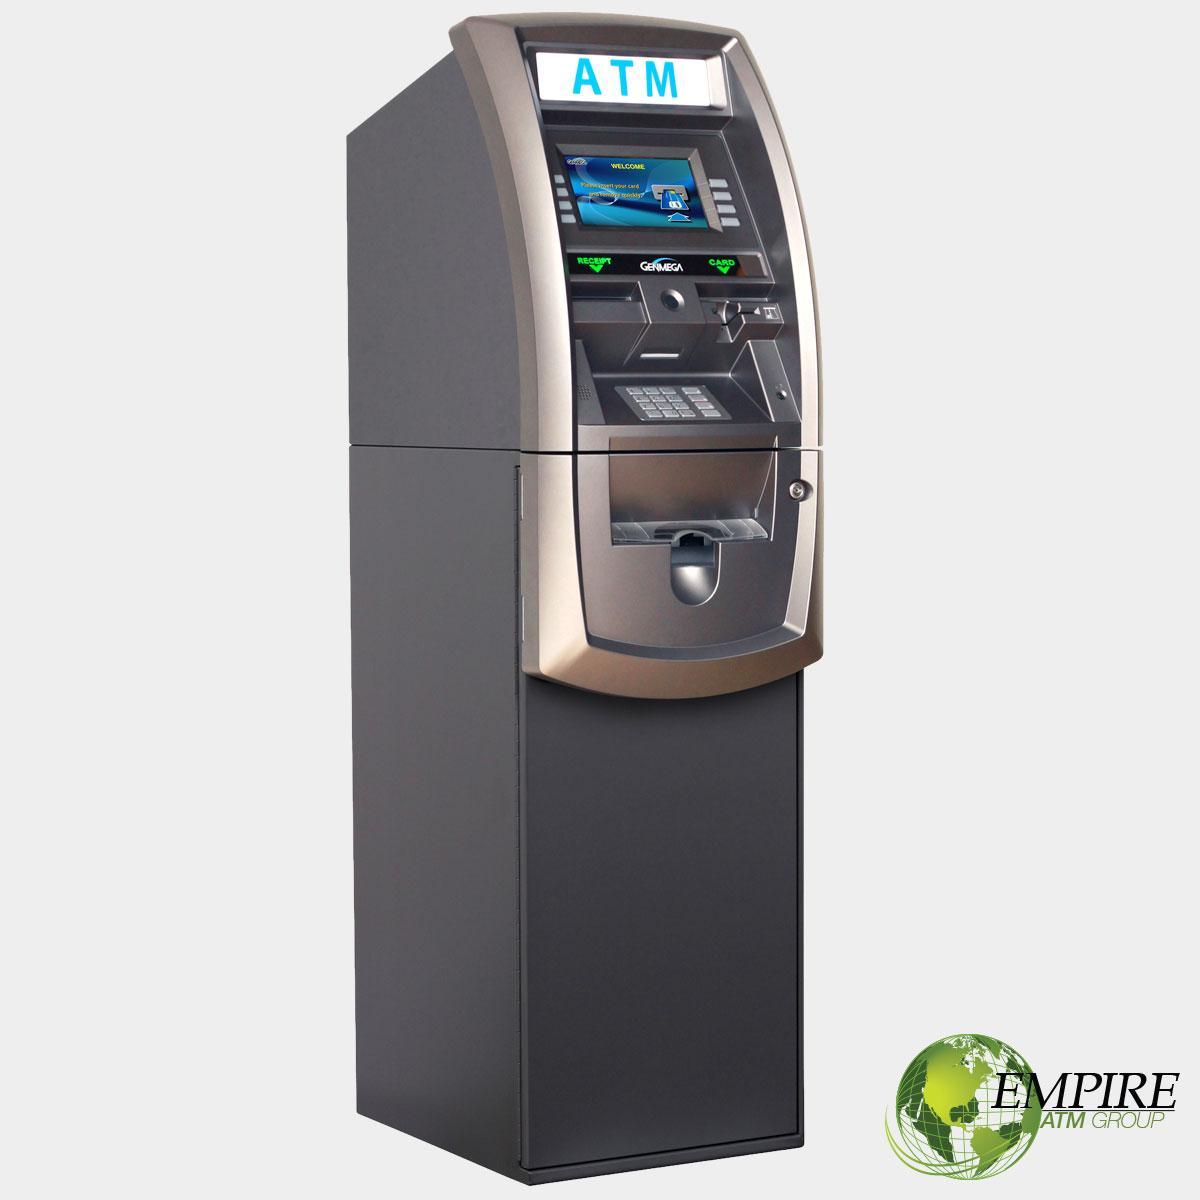 atm machine business franchise